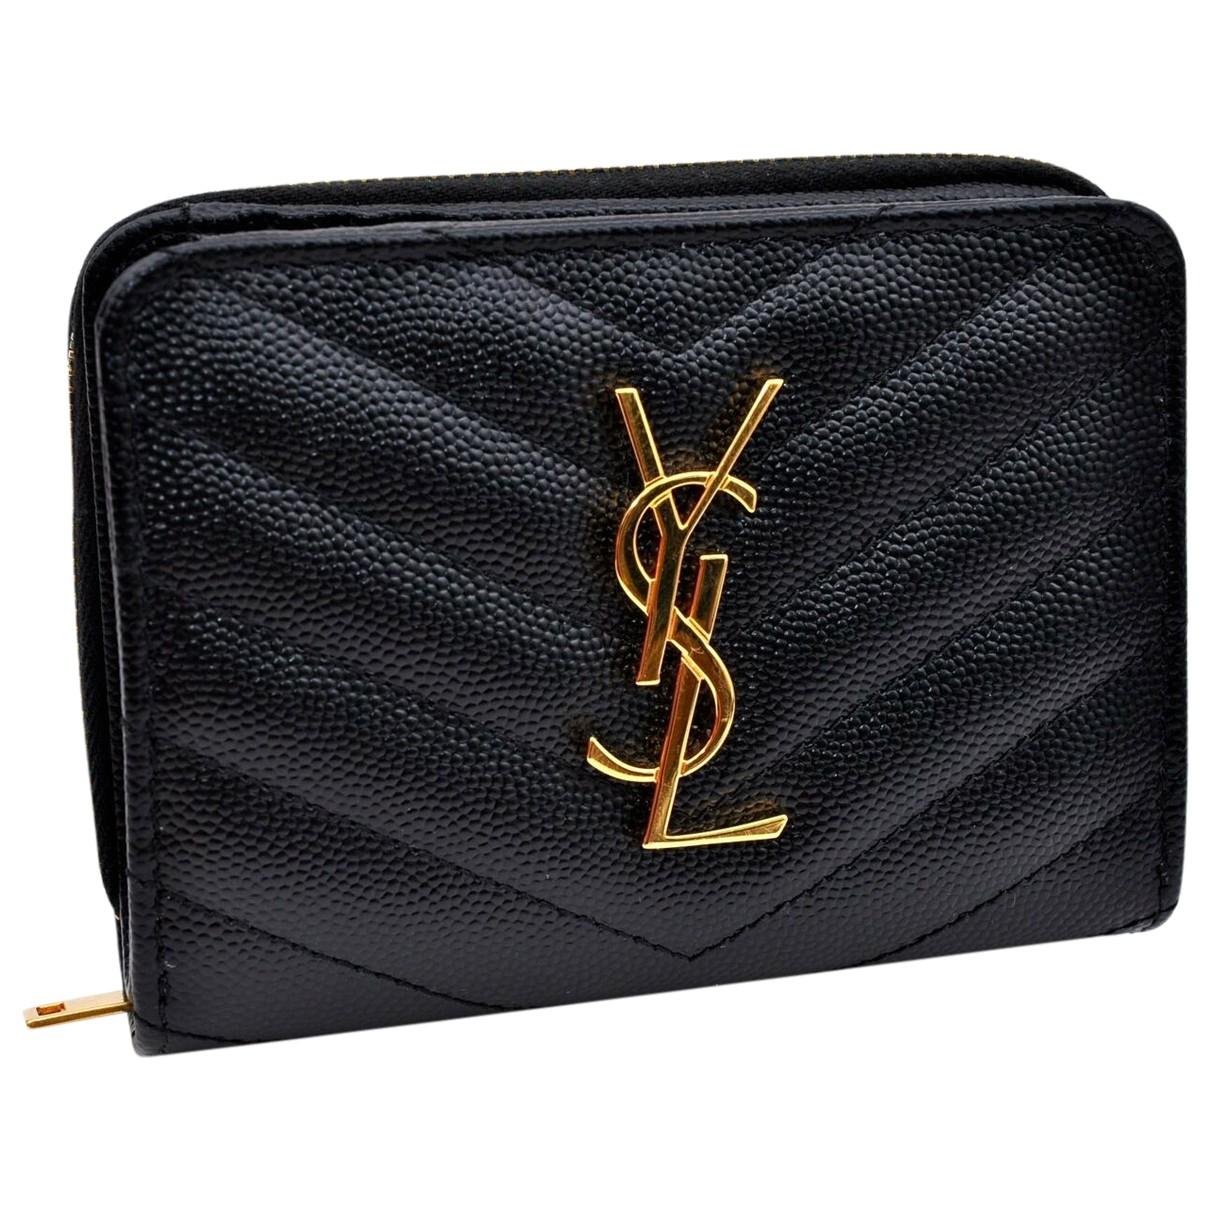 Yves Saint Laurent \N Black Leather wallet for Women \N